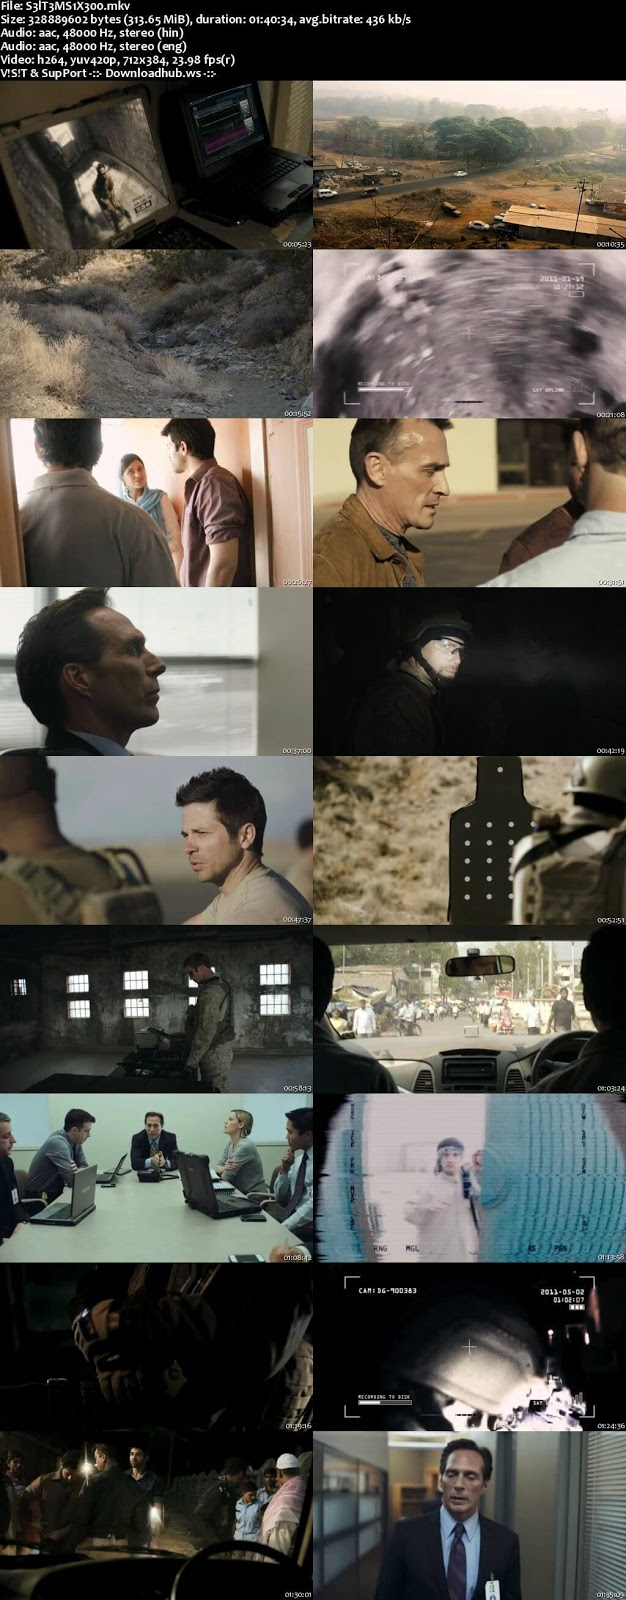 Seal Team Six The Raid on Osama Bin Laden 2012 Hindi Dual Audio 480p BluRay Free Download